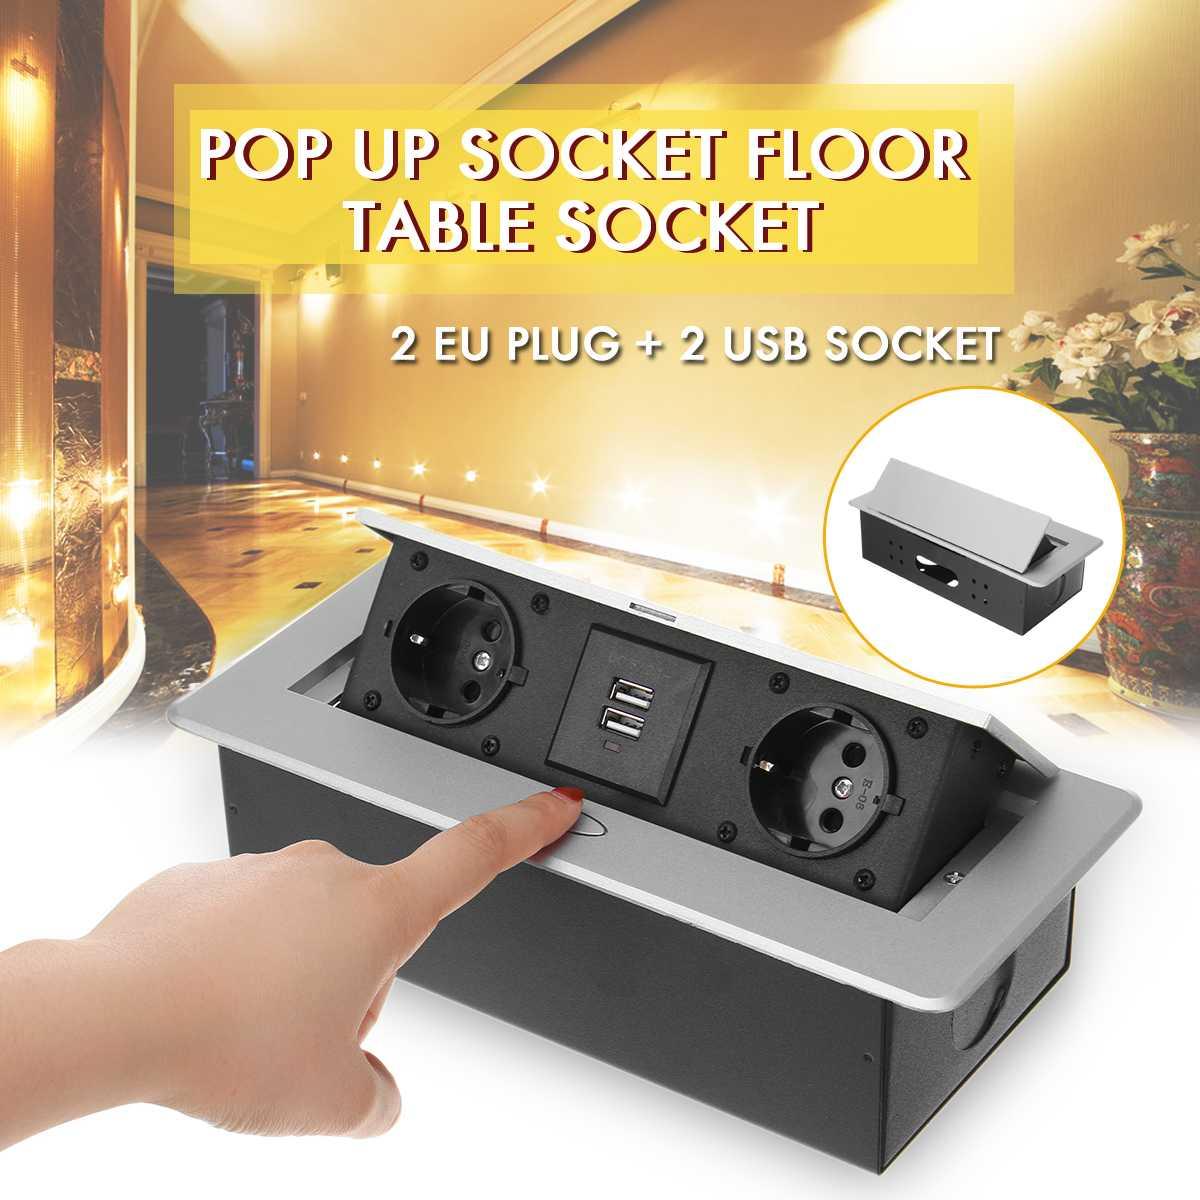 SWILET Silver Aluminum Alloy 16A Slow UP 2 Power EU Socket Dual USB Charge Port 2.1A Office Table Desktop Outlet Black Steel Box